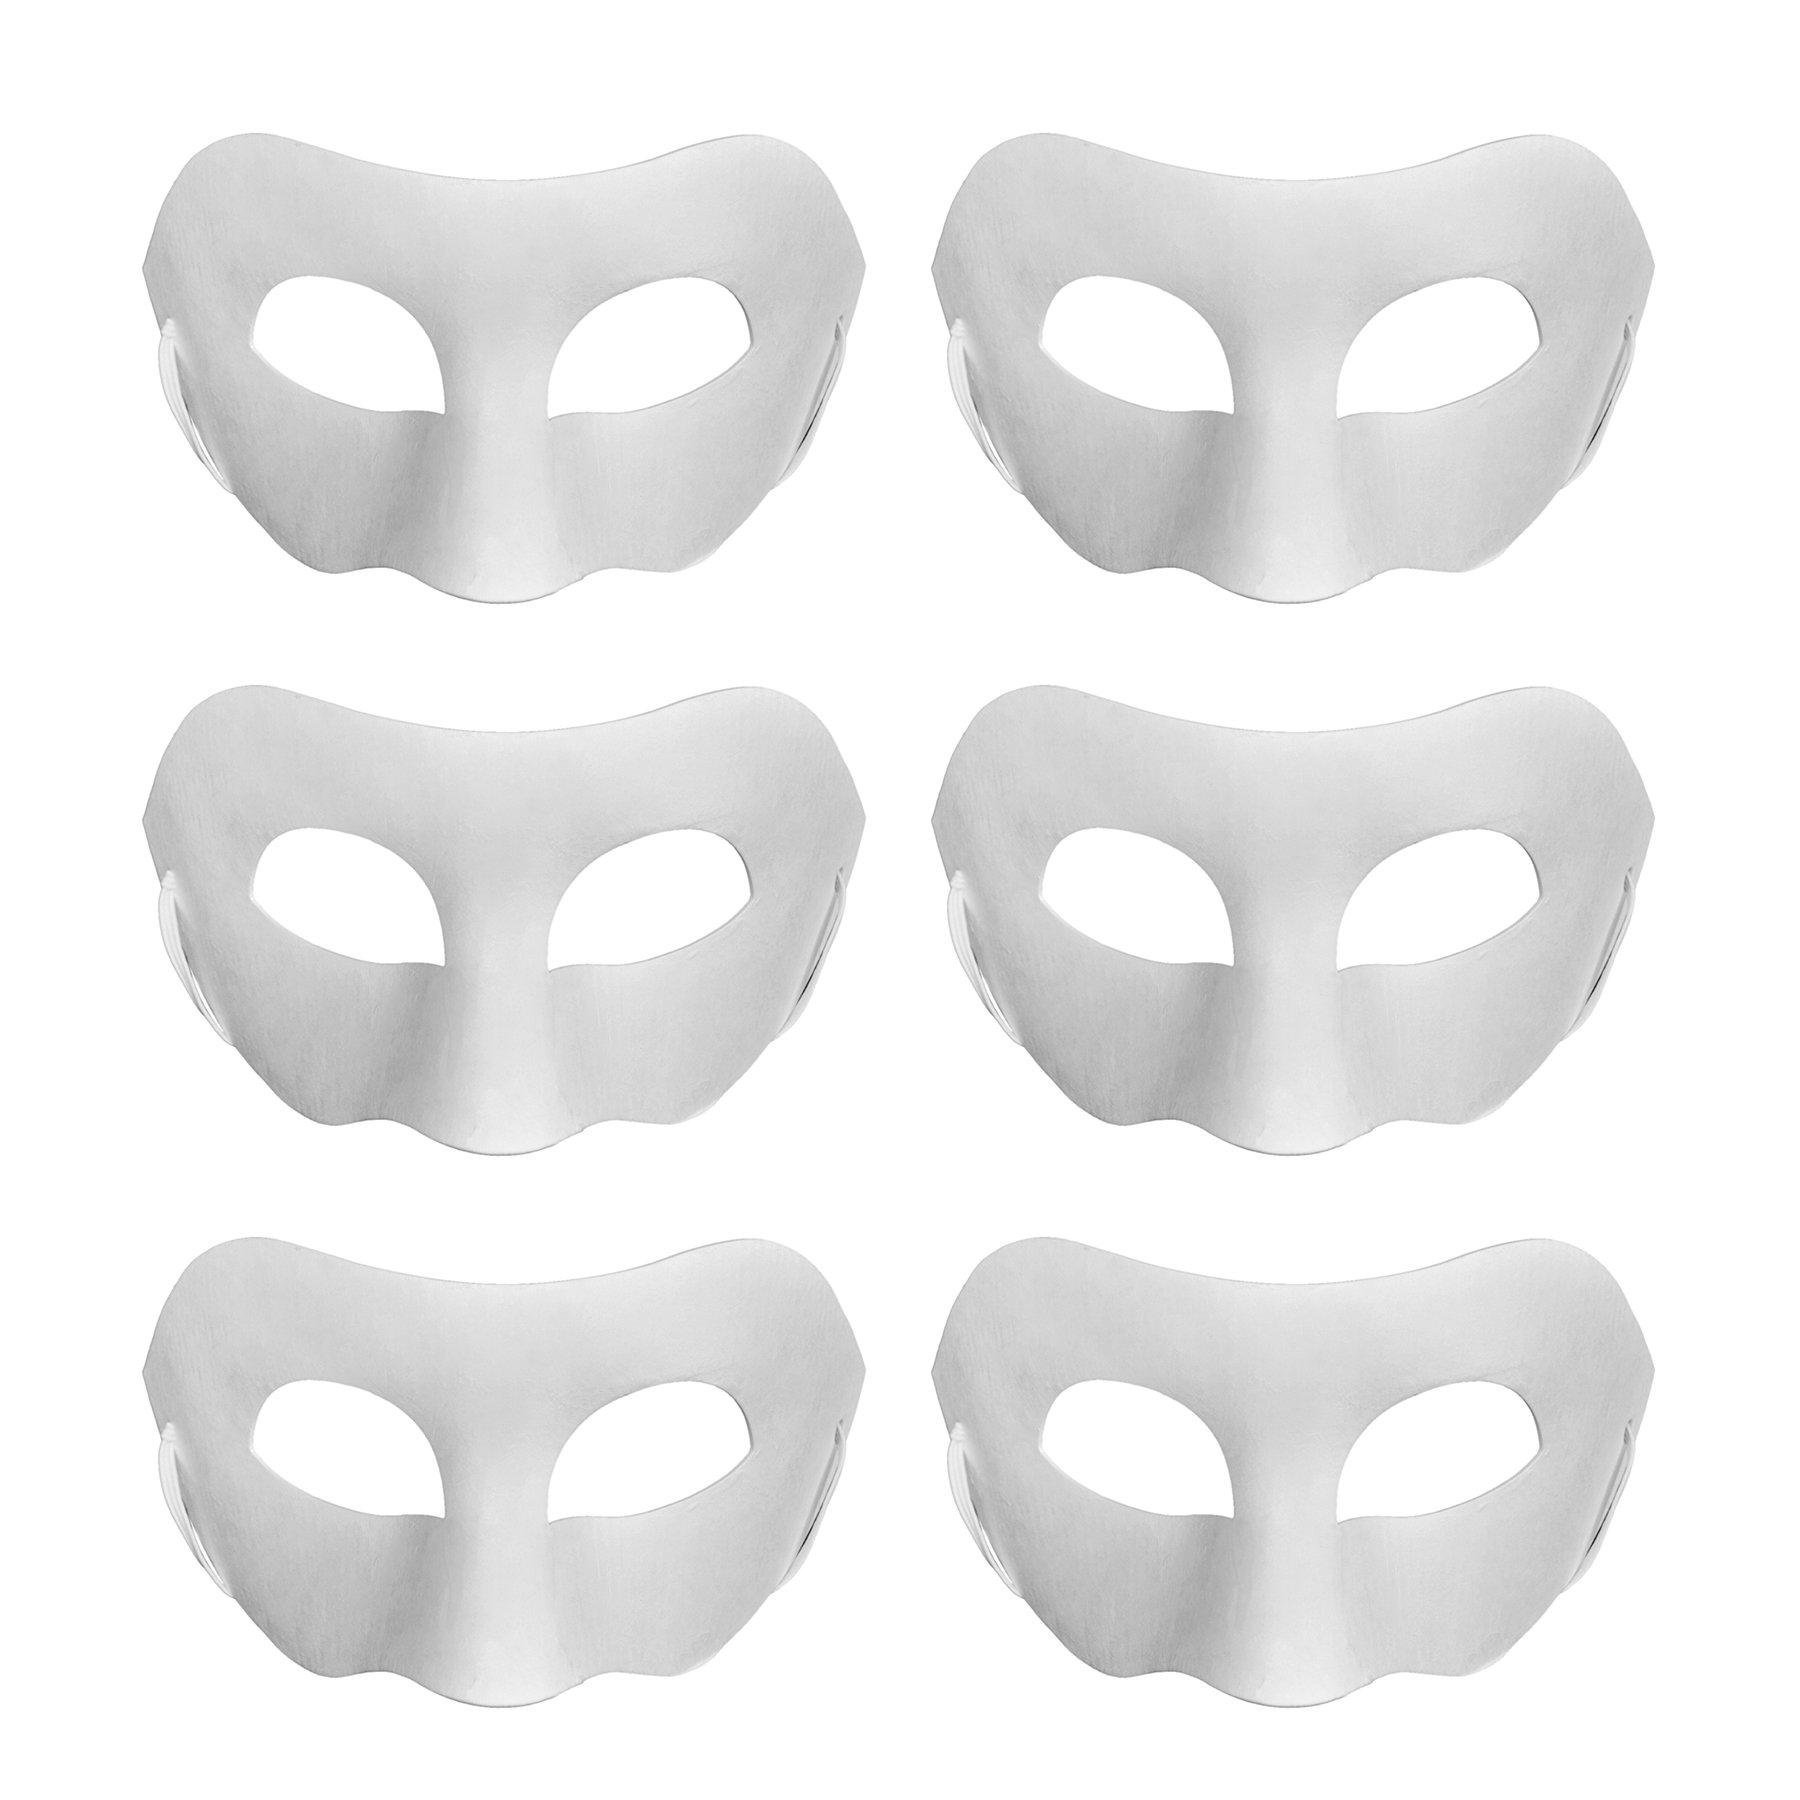 Aspire 6 PCS Blank DIY Half Masks Craft Paper Halloween Masquerade Face Mask Decorating Party Costume